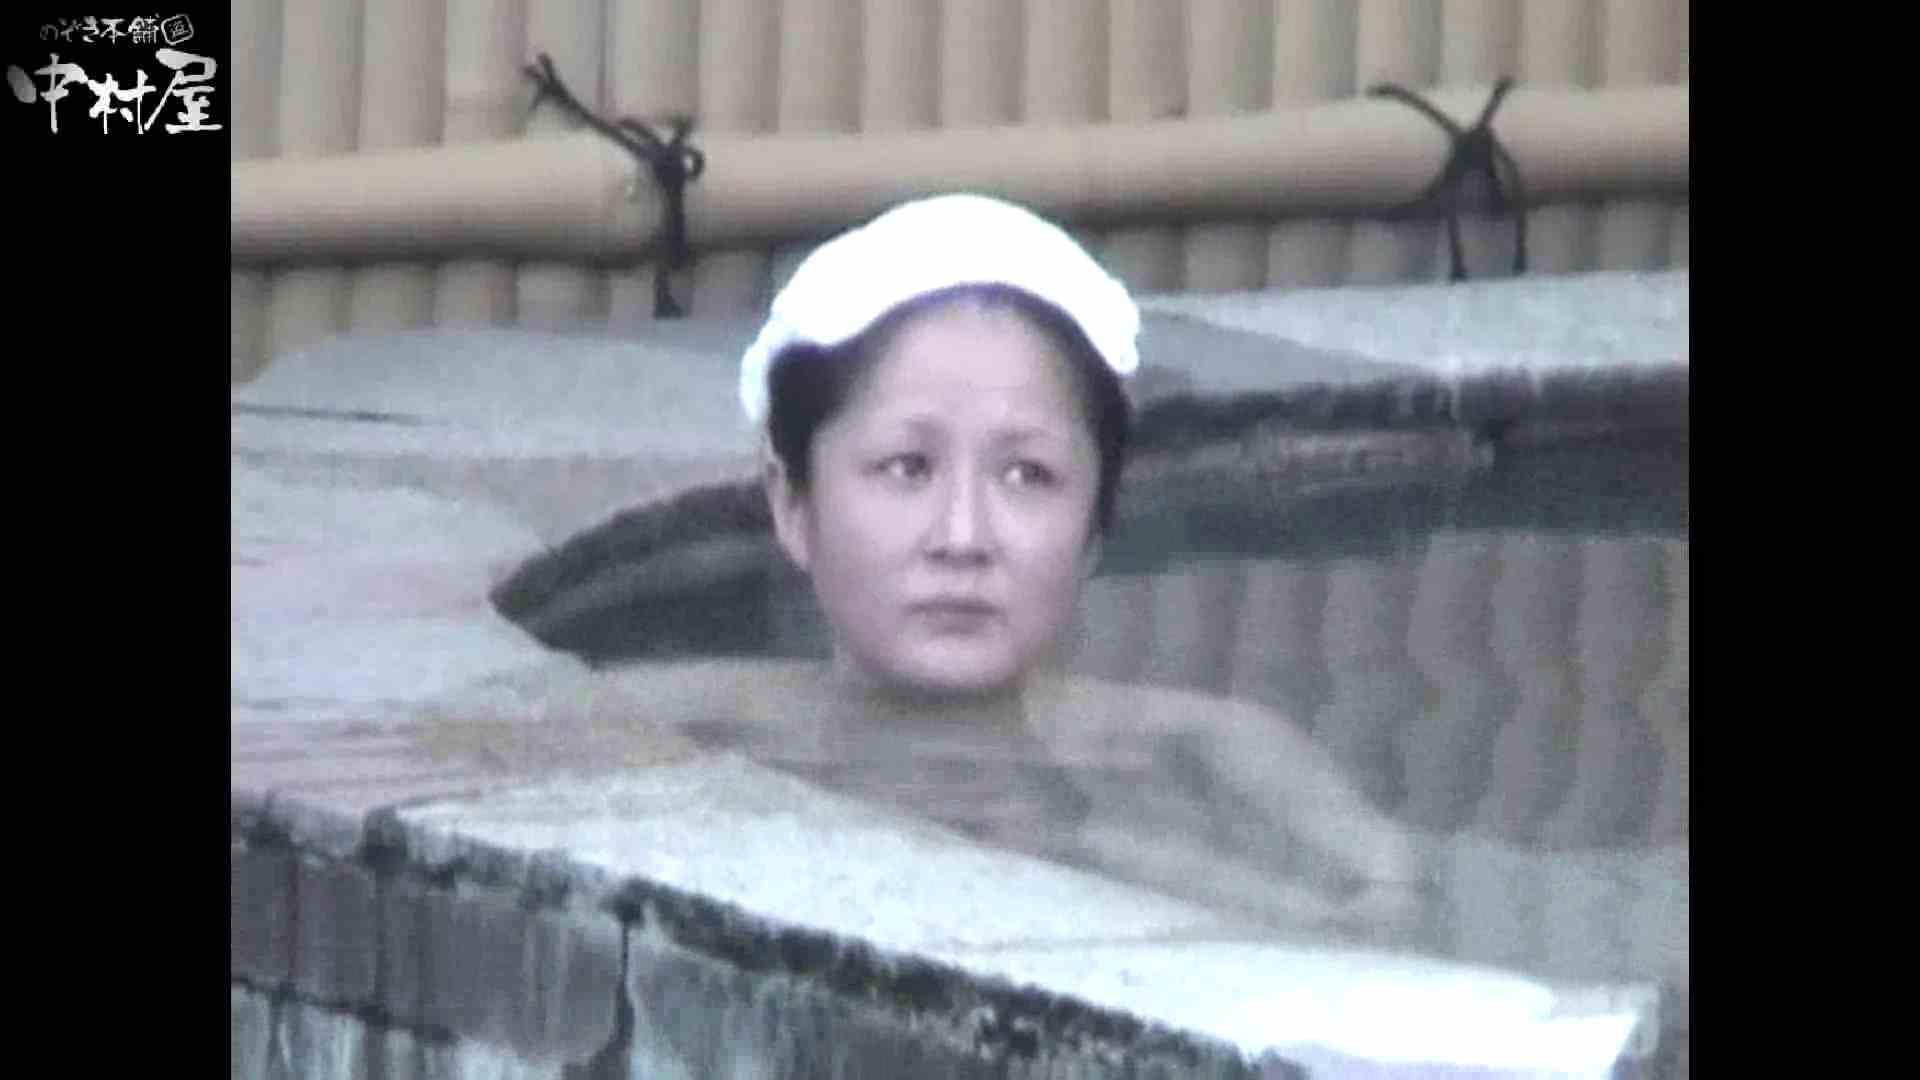 Aquaな露天風呂Vol.880潜入盗撮露天風呂十六判湯 其の六 露天 | 潜入シリーズ  95pic 70